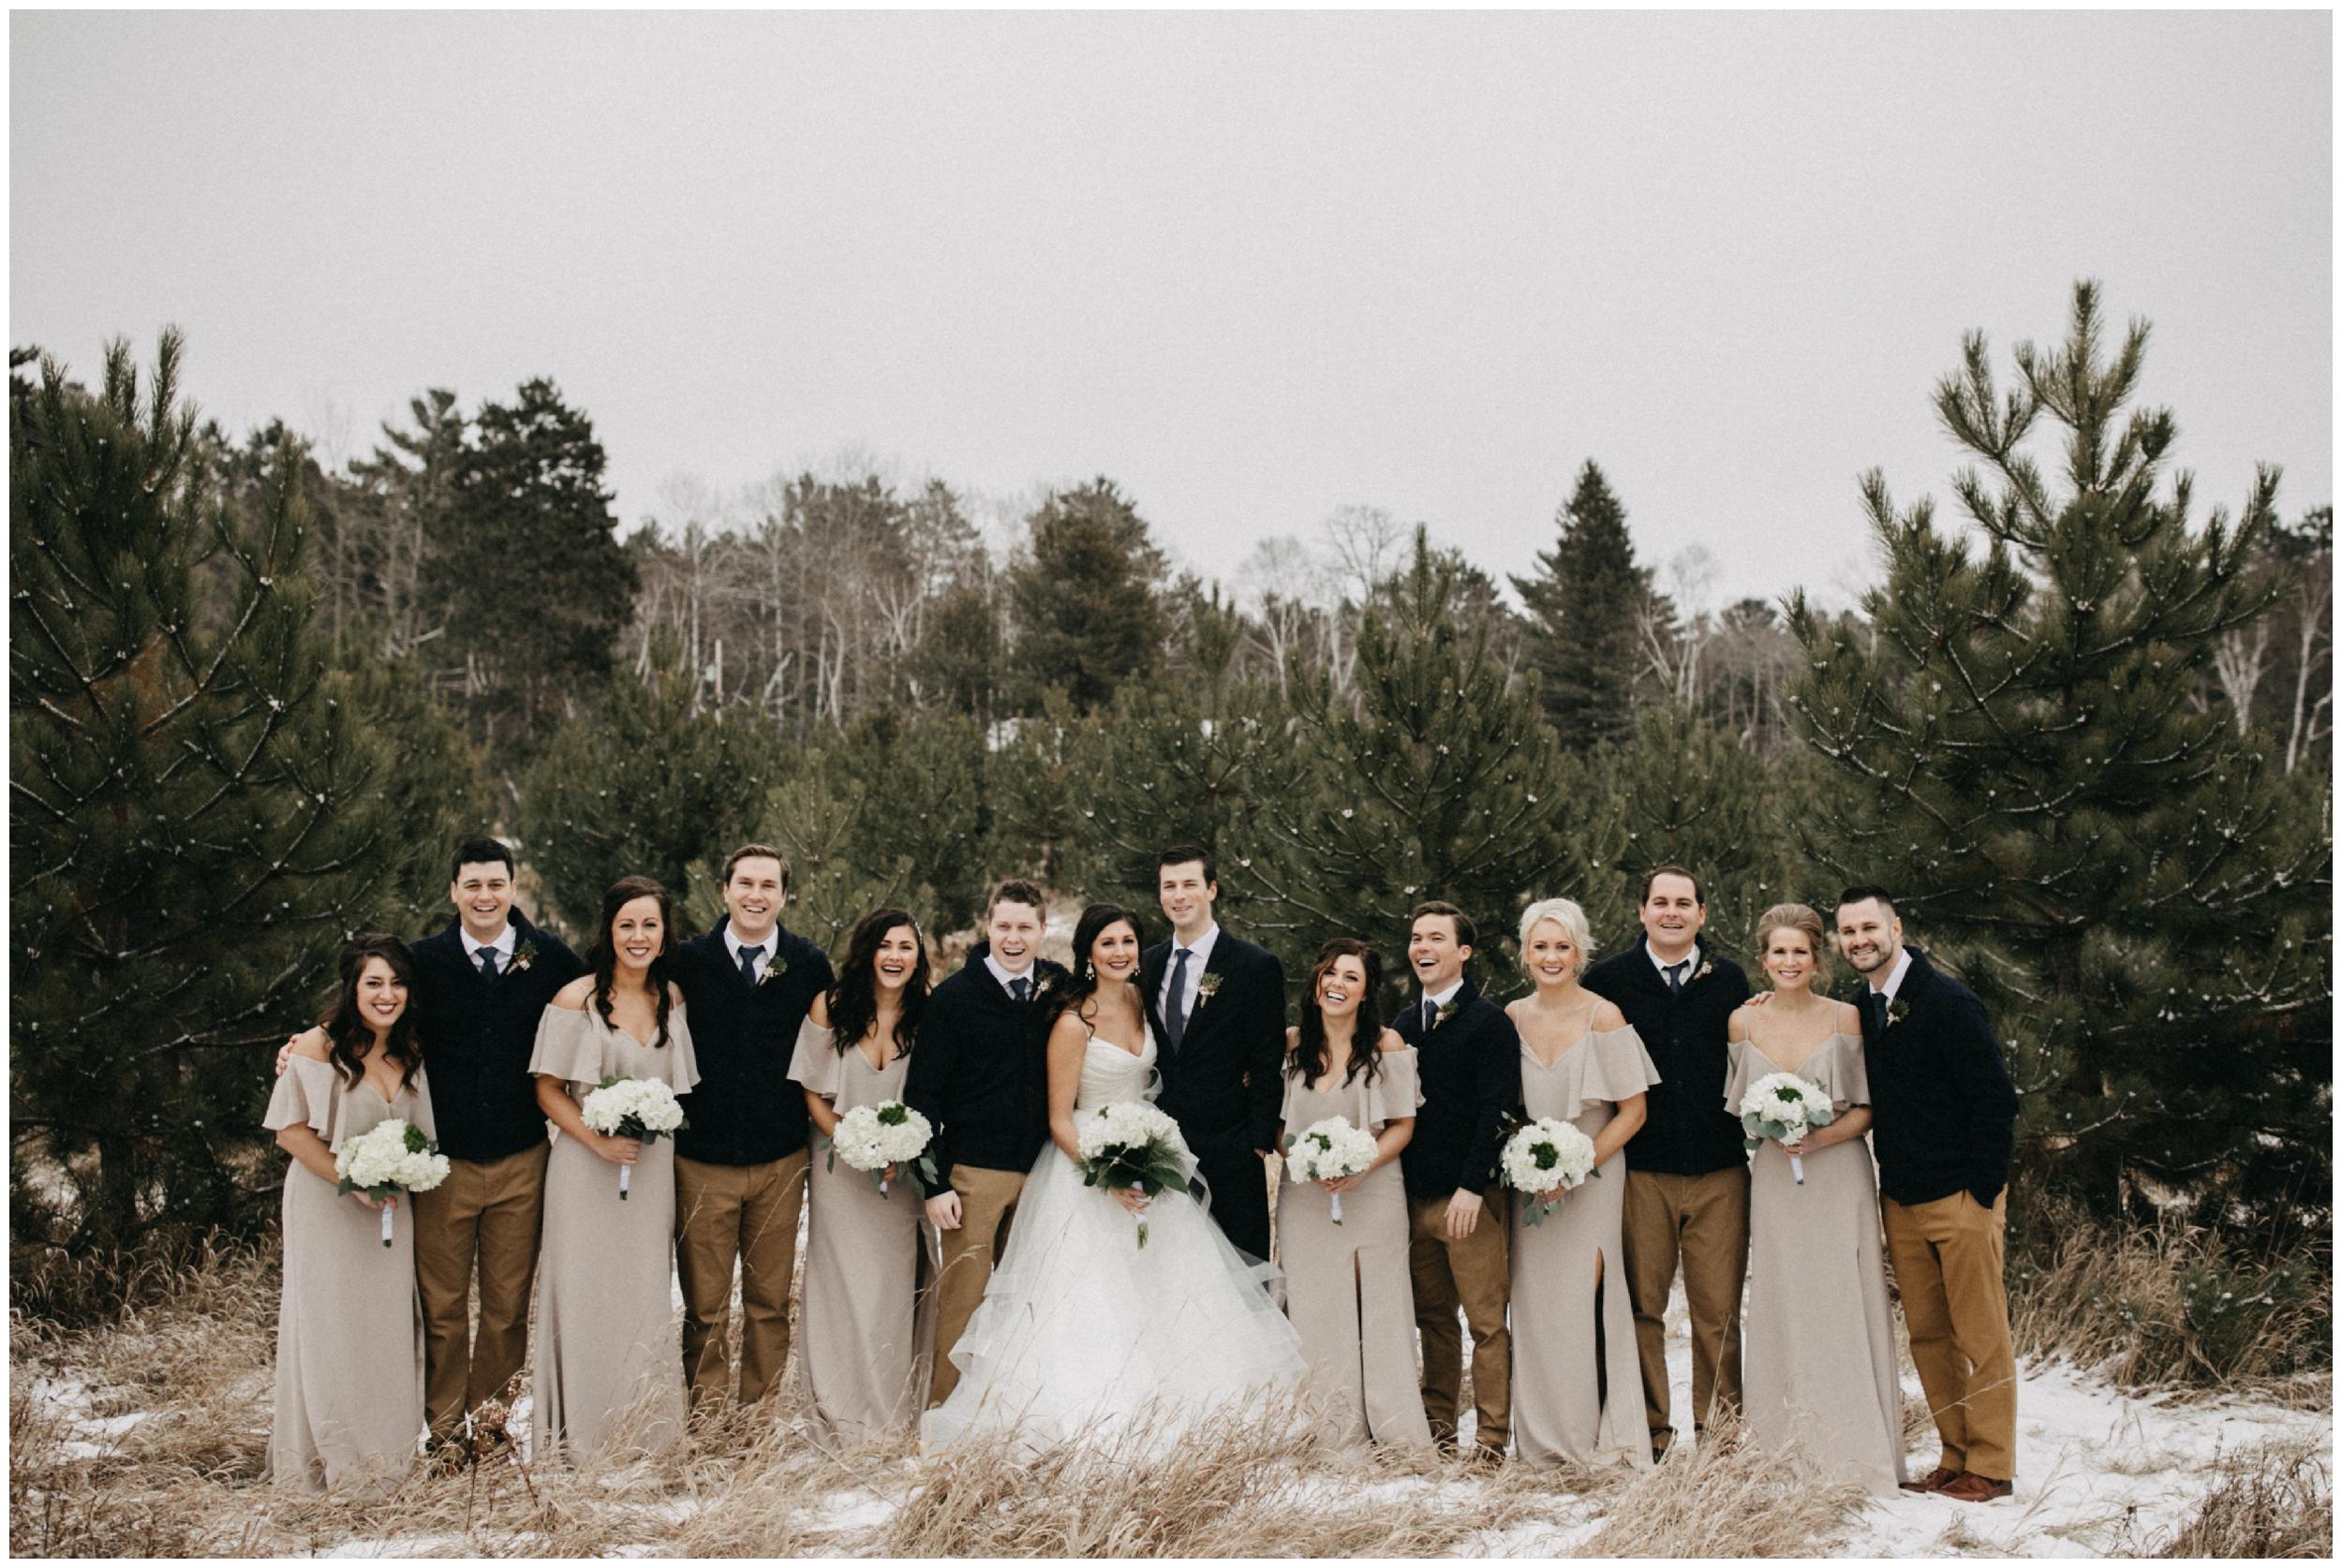 Winter wedding in Crosslake Minnesota photographed by Britt DeZeeuw